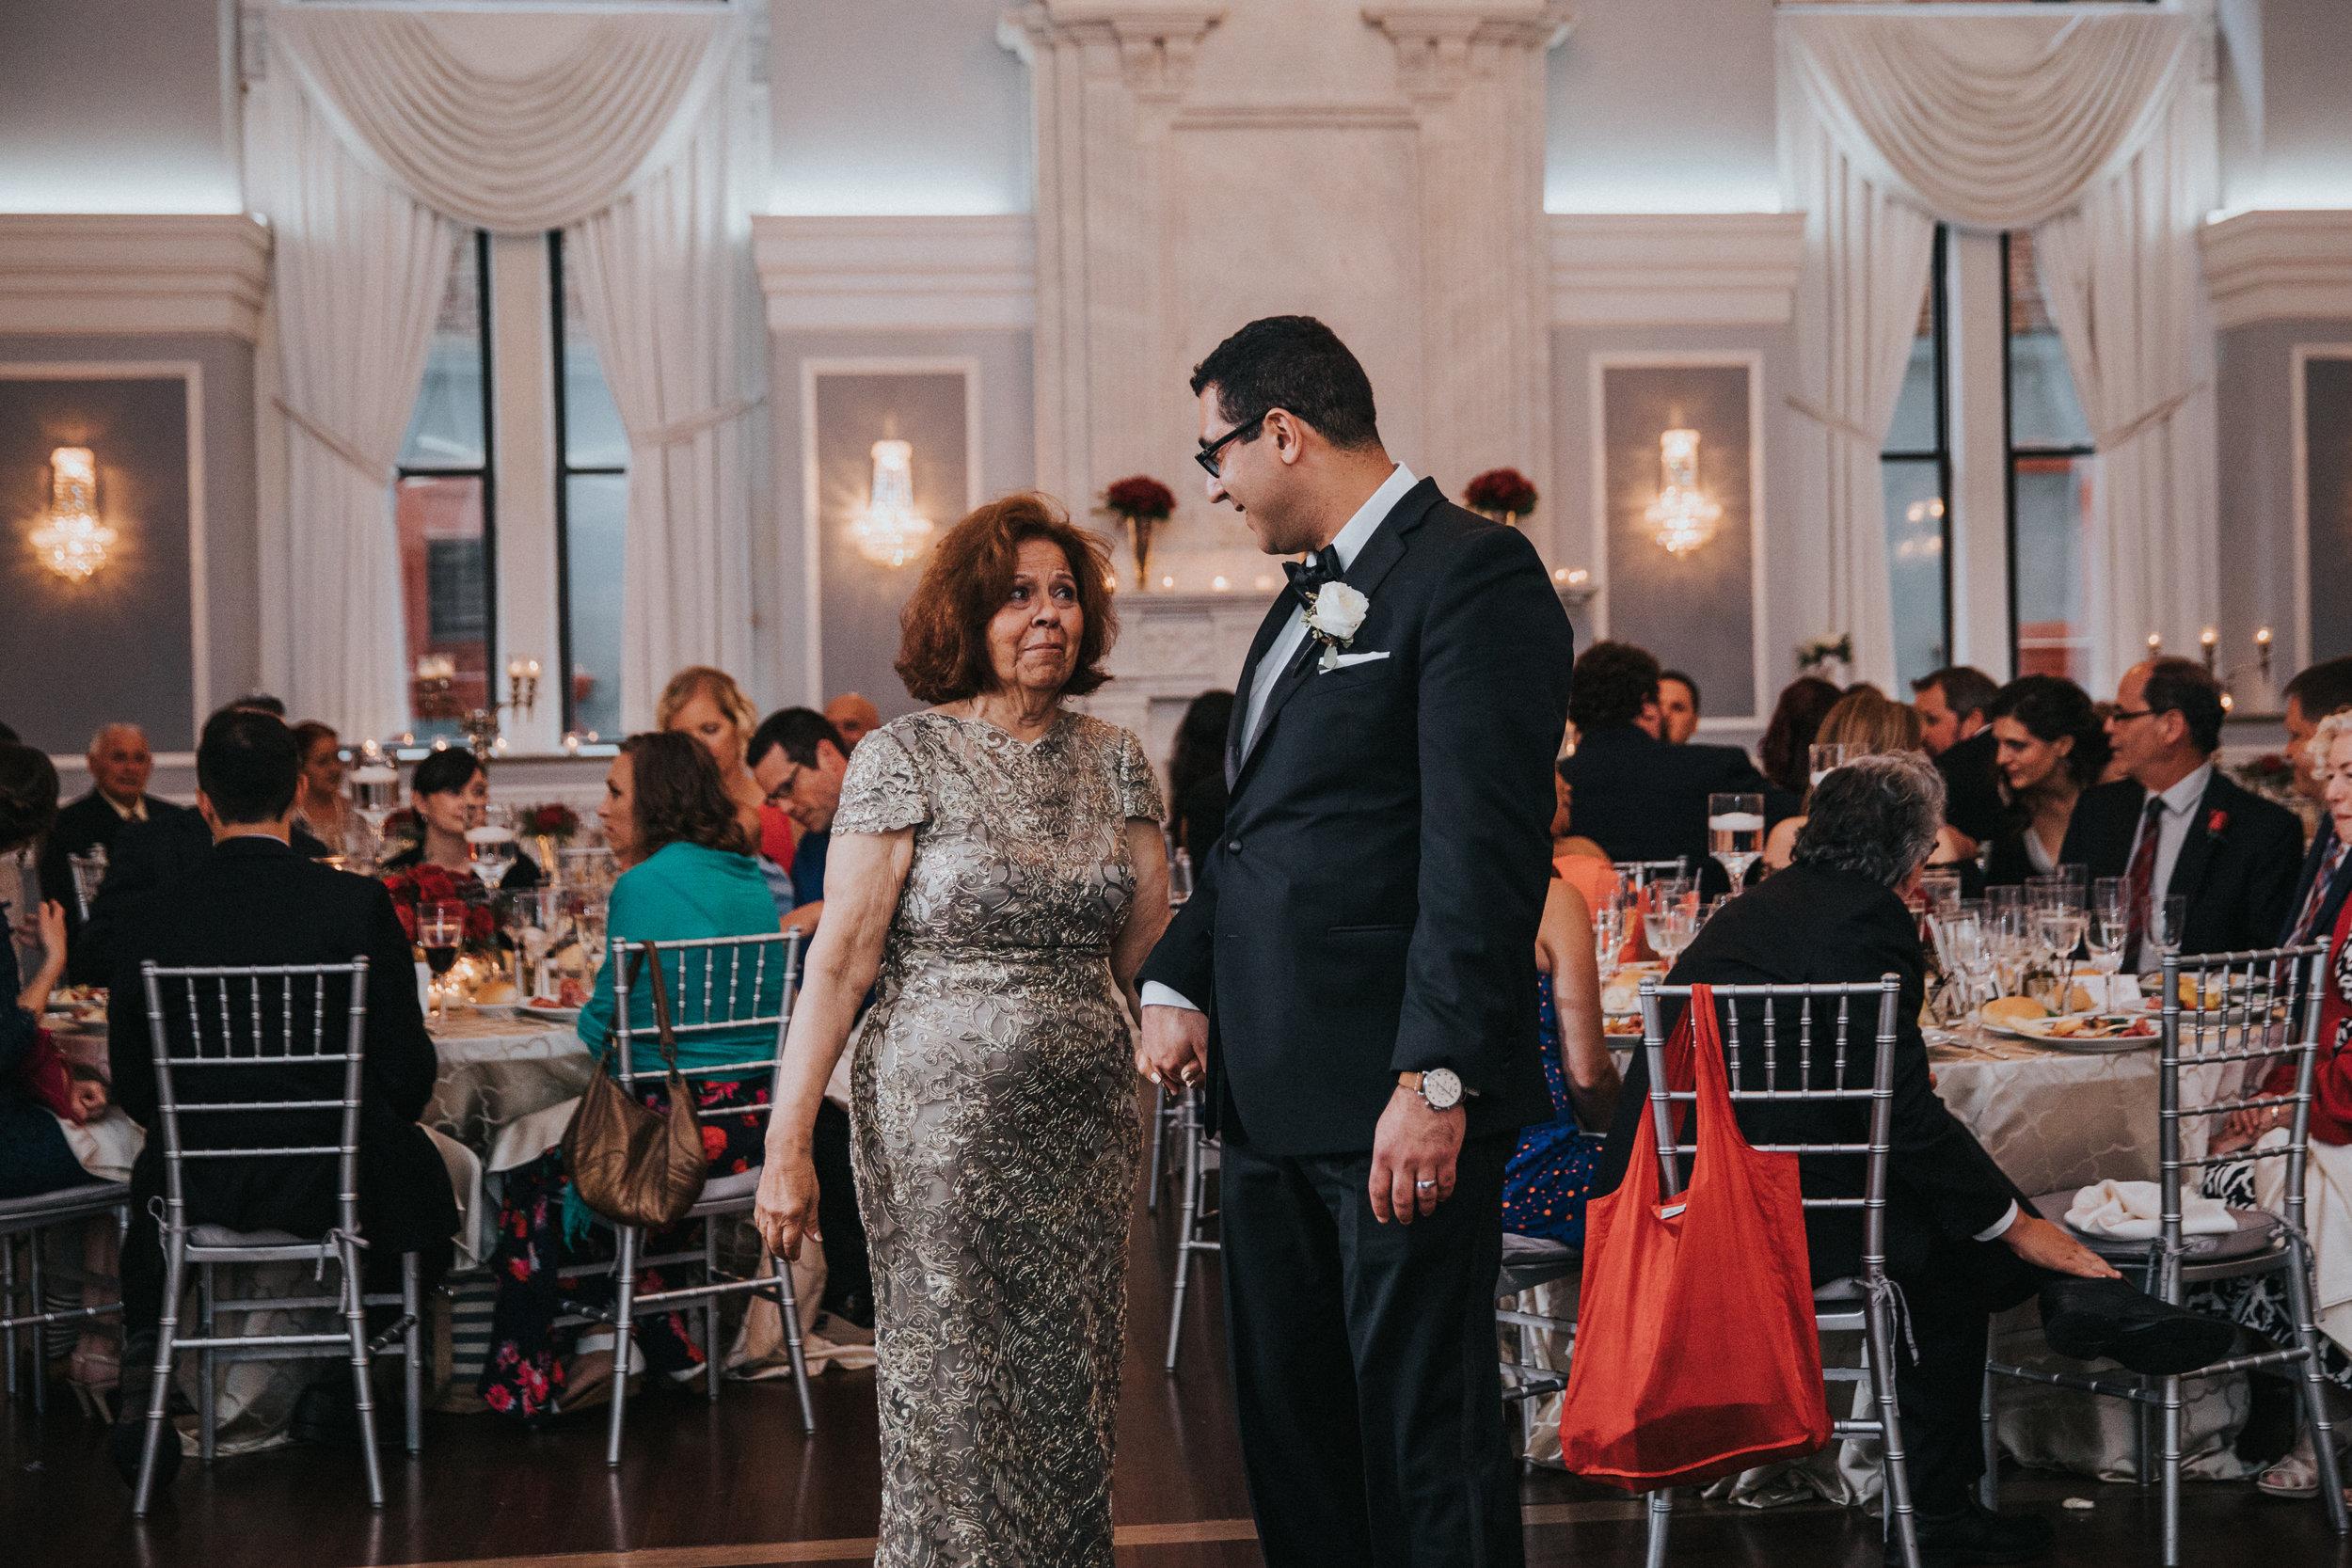 JennaLynnPhotography-NJWeddingPhotographer-Philadelphia-Wedding-ArtsBallroom-Reception-50.jpg